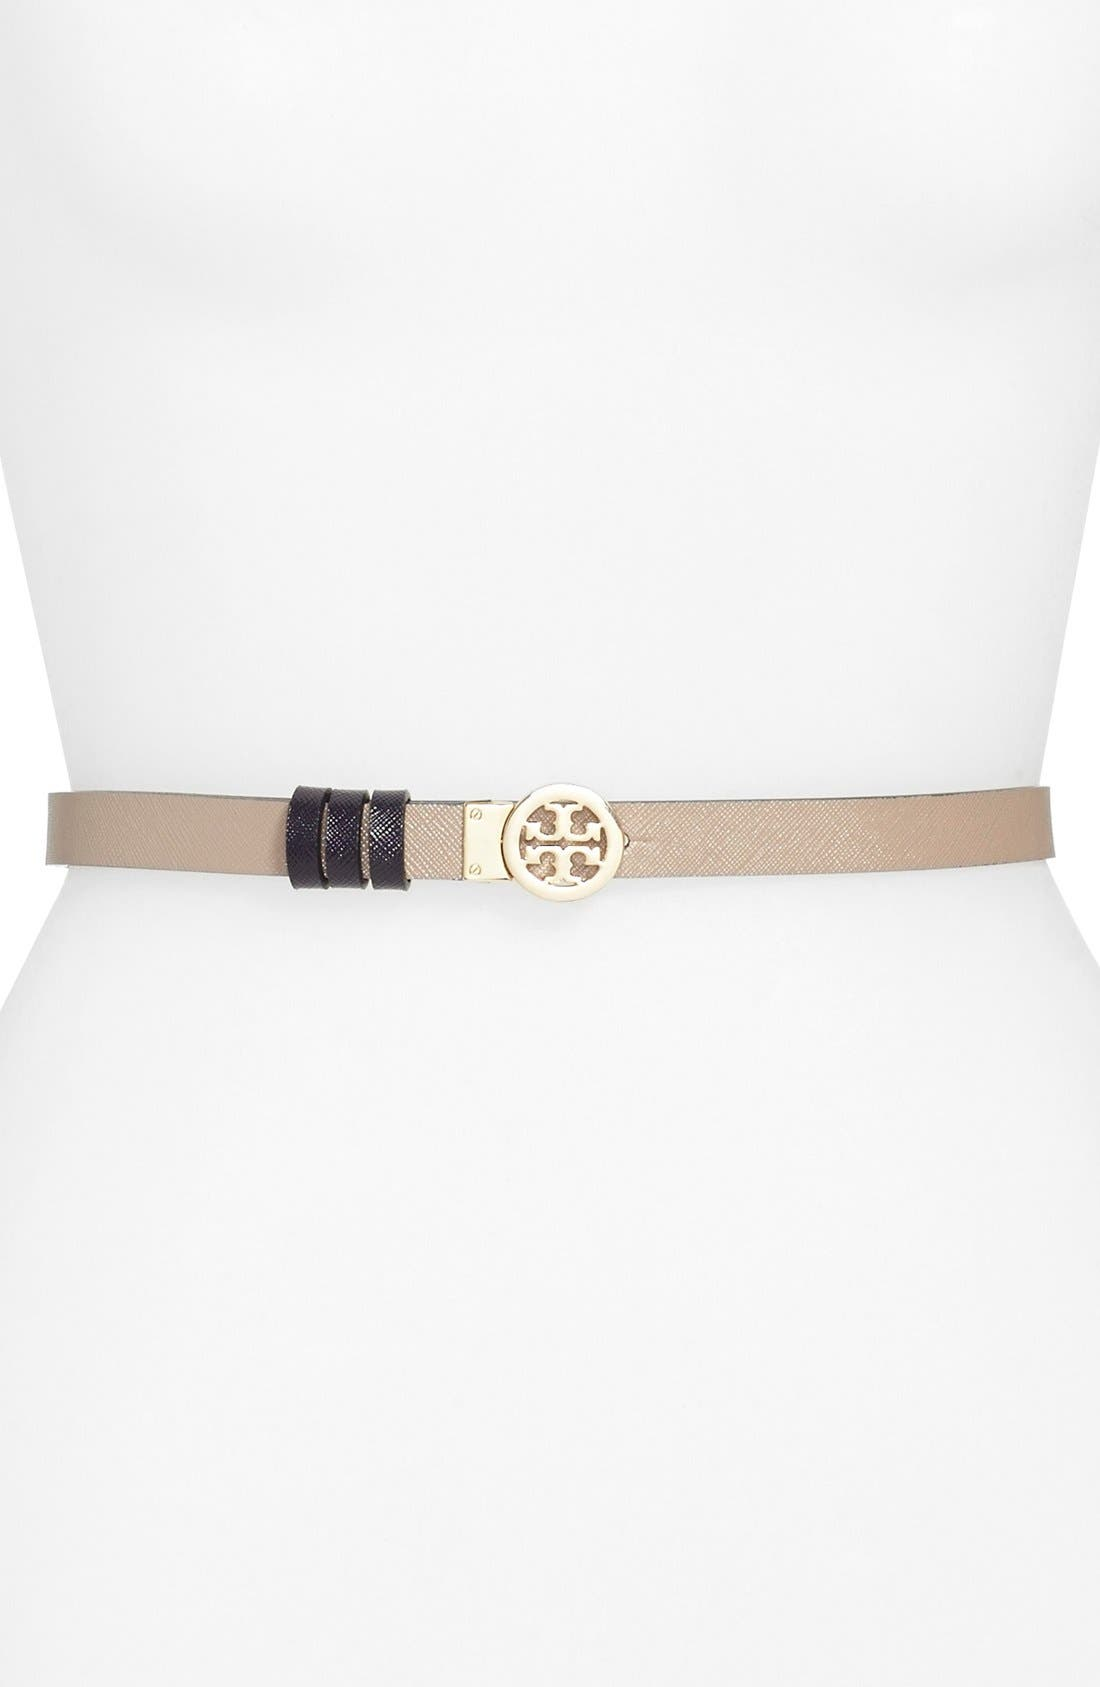 TORY BURCH, Rotating Logo Skinny Leather Belt, Main thumbnail 1, color, 024